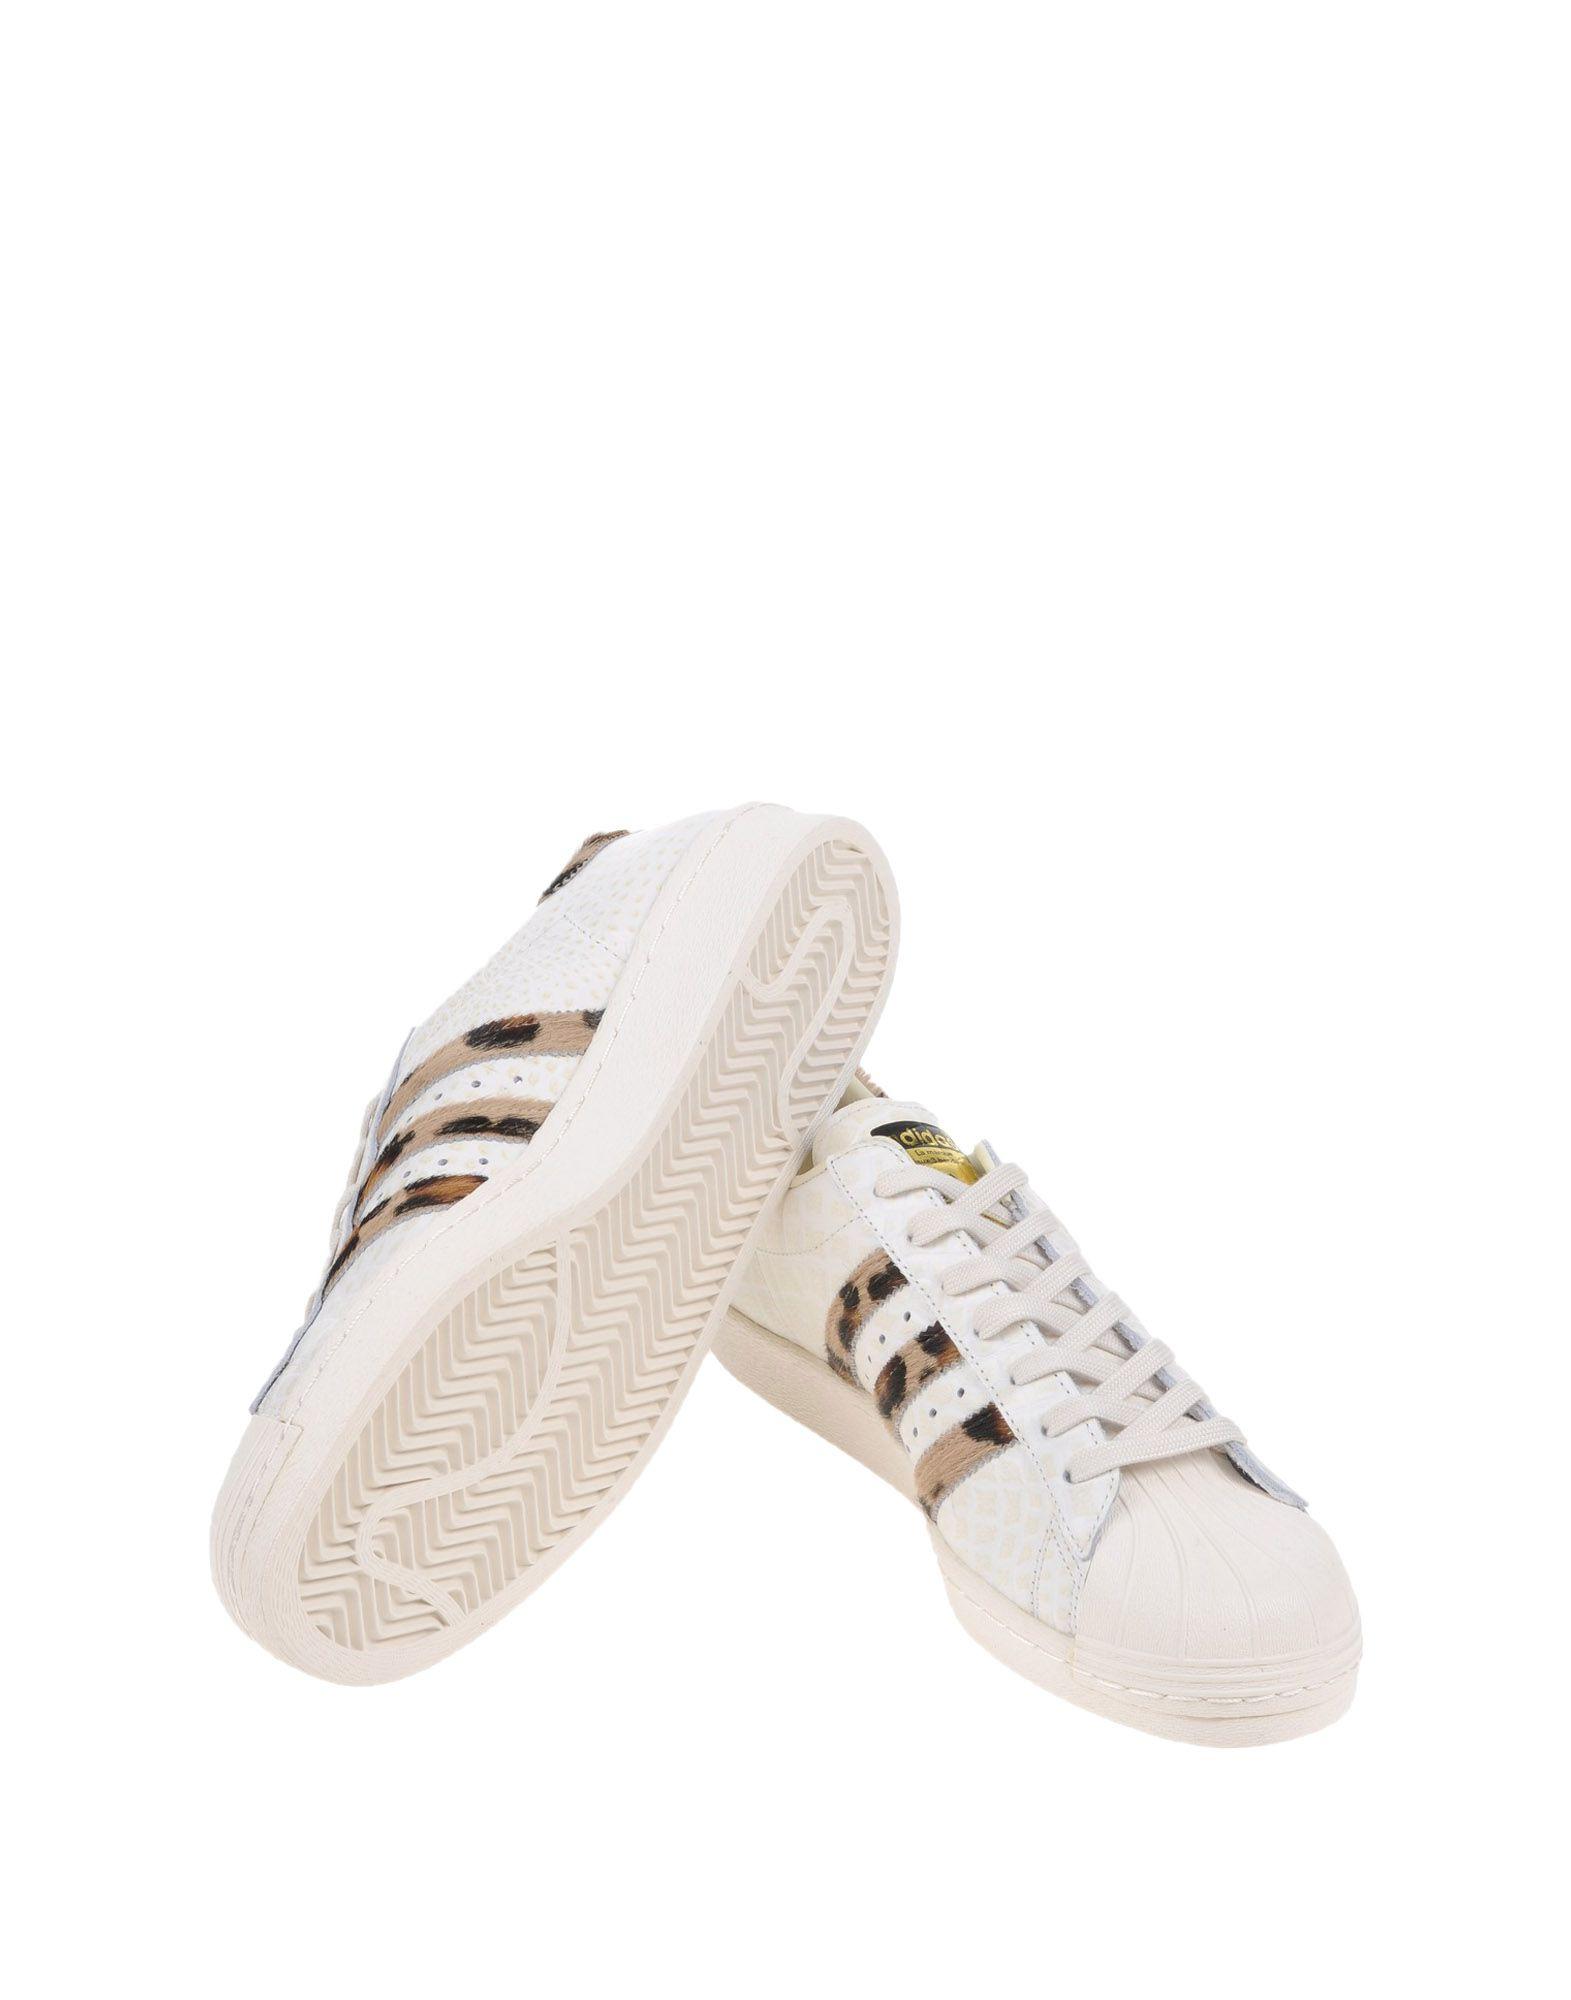 Anima Adidas Originals Superstar 80S Anima   11012985UK 9a57cb